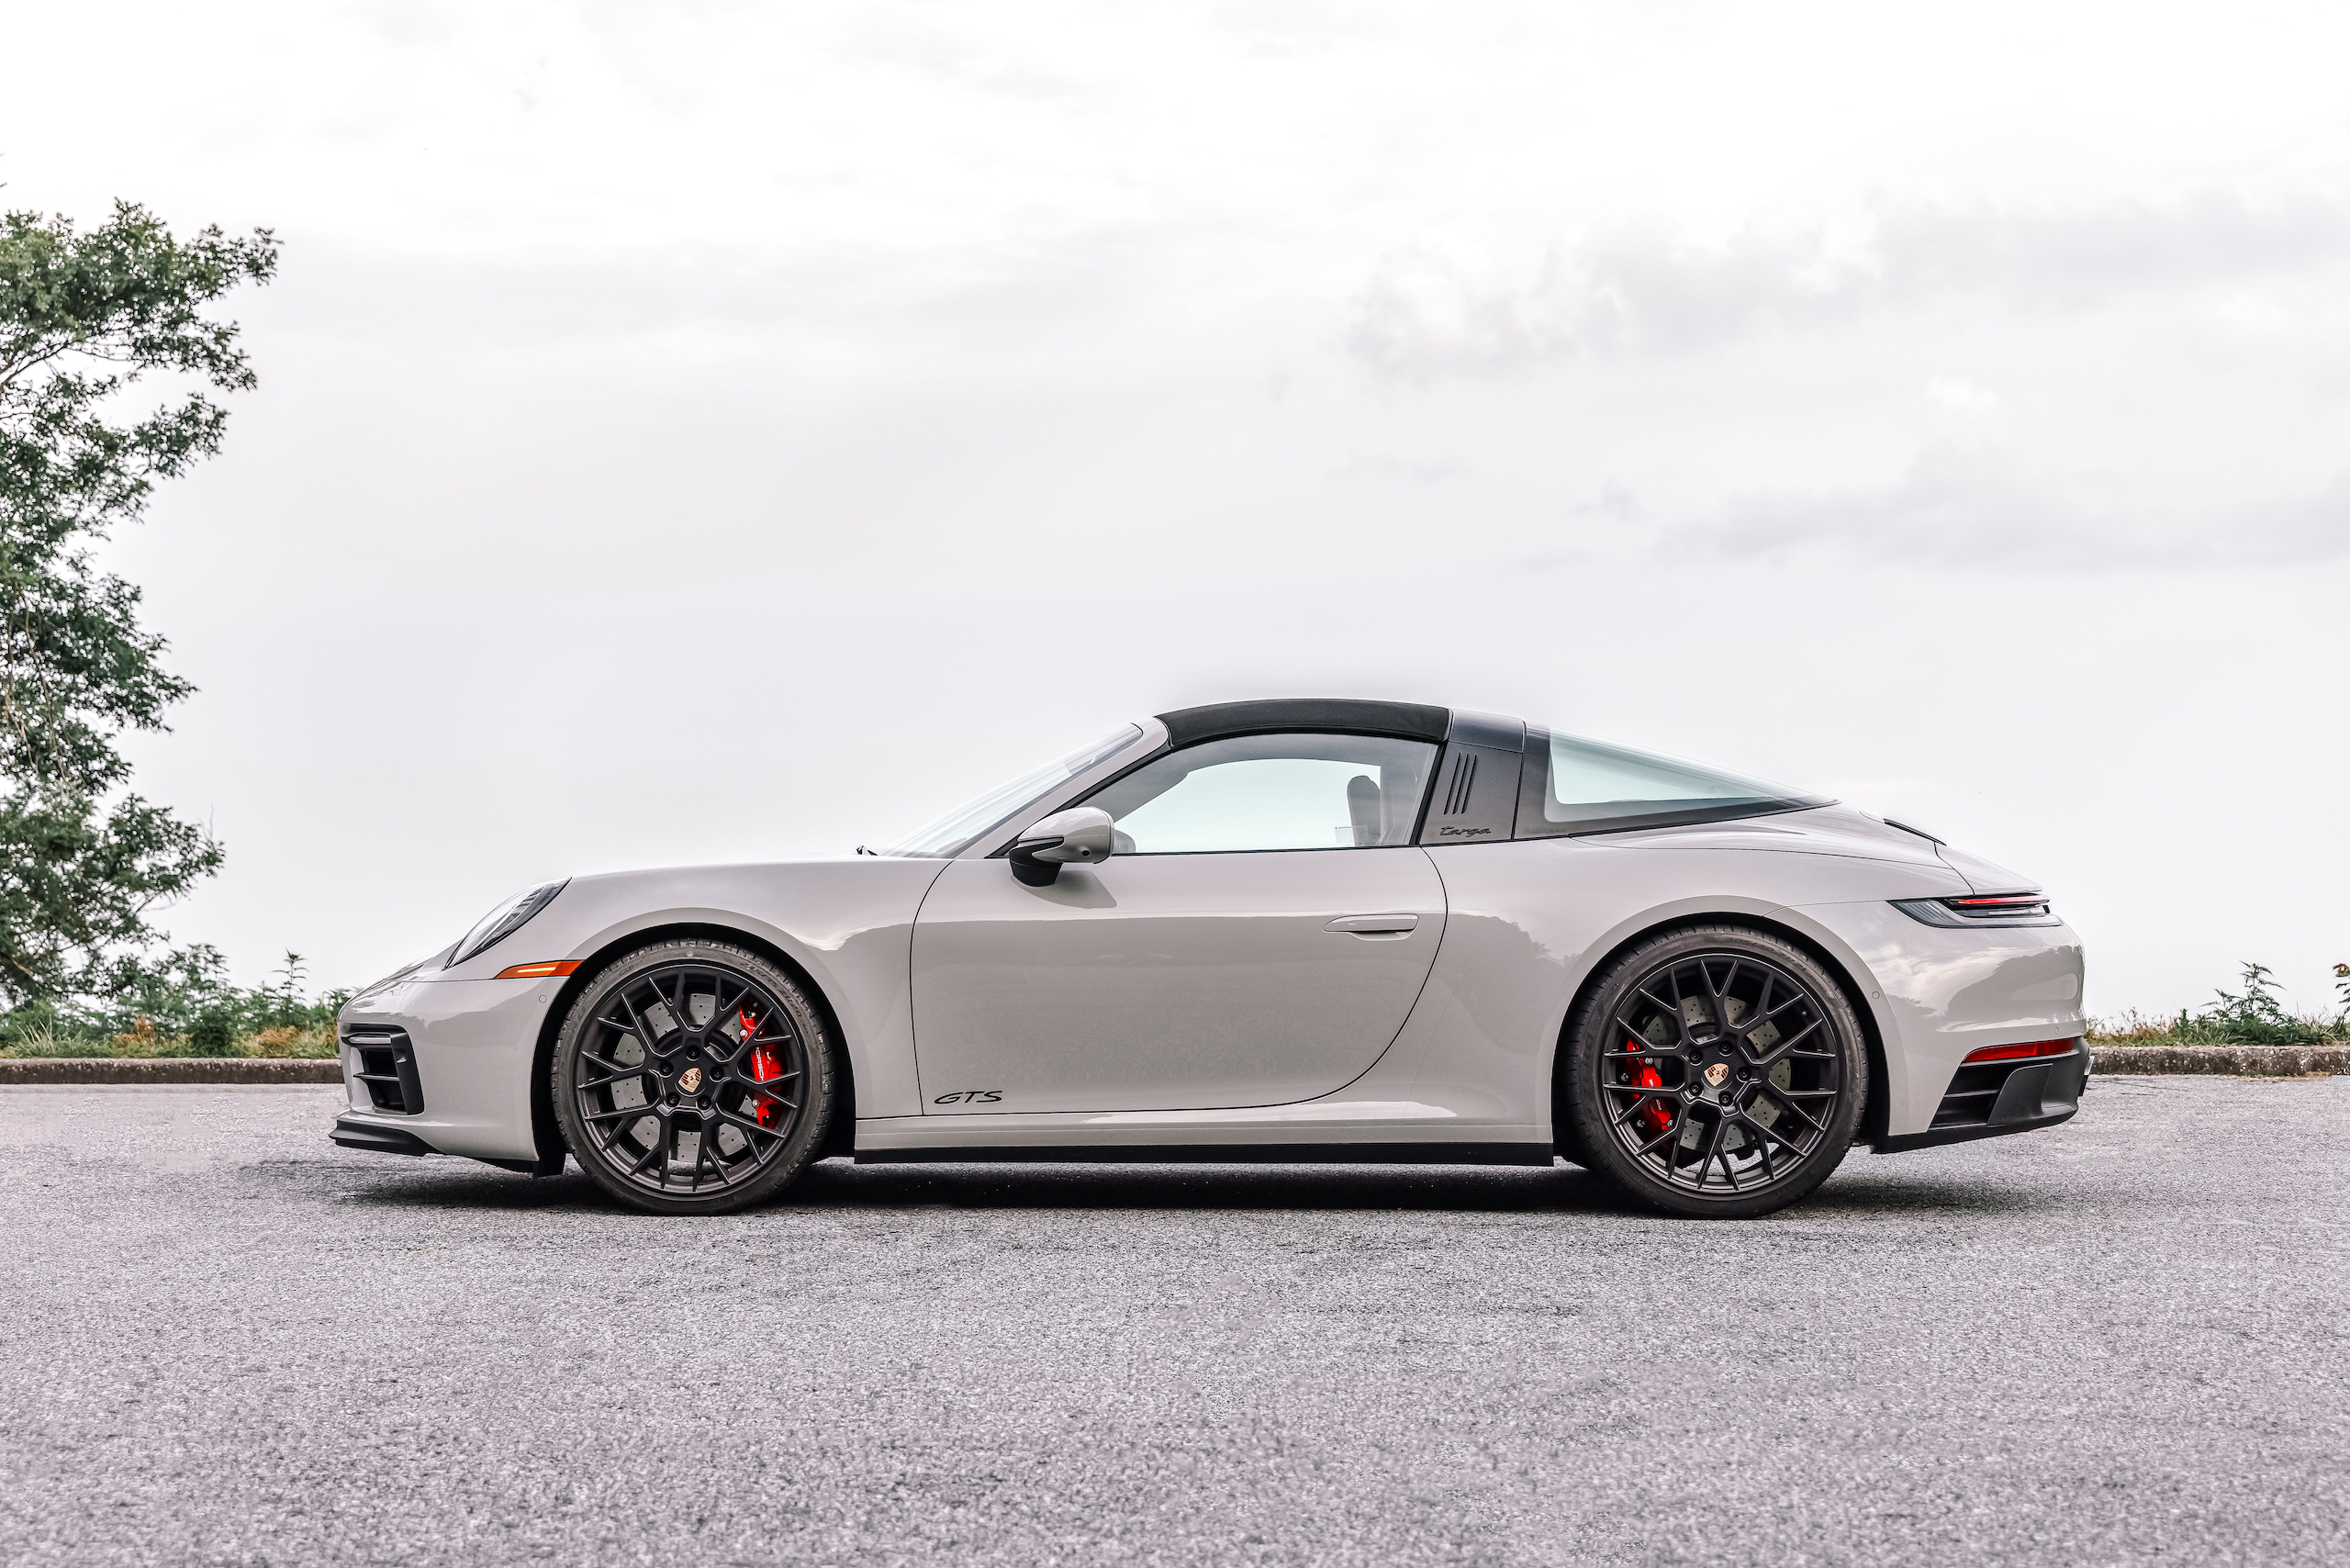 Porsche 911 Targa 4 GTS side profile top up